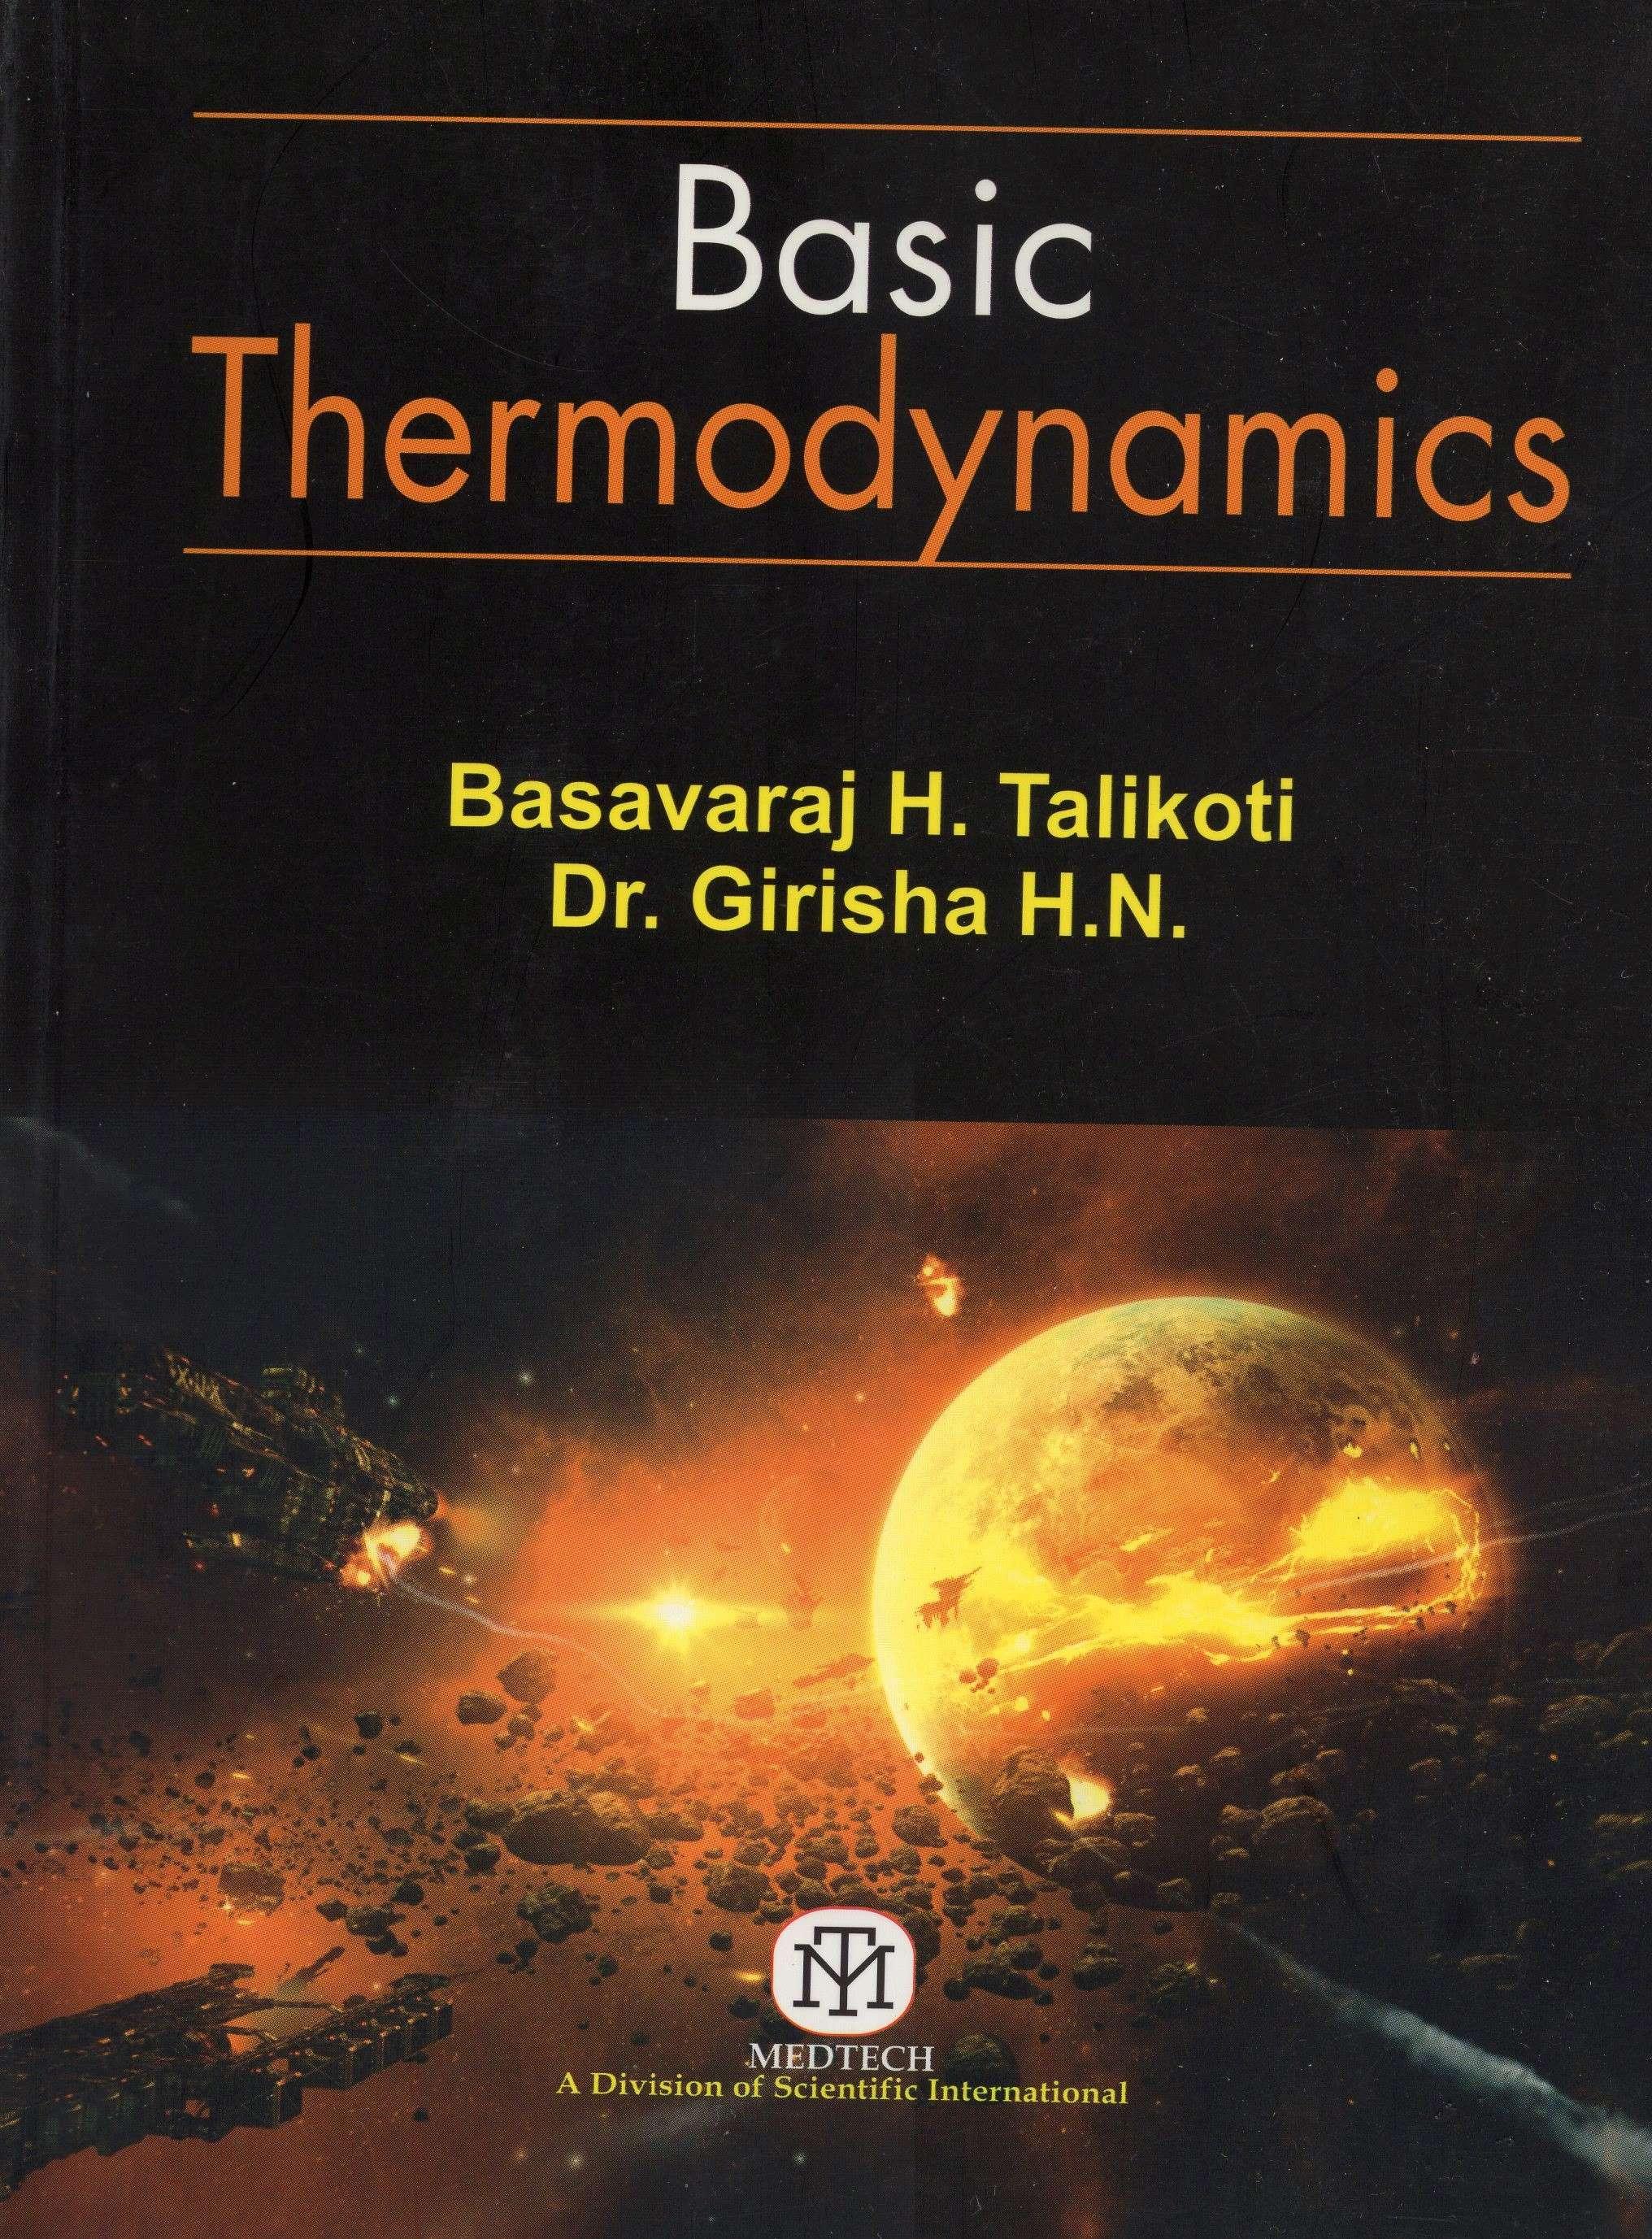 Basic Thermodynamics